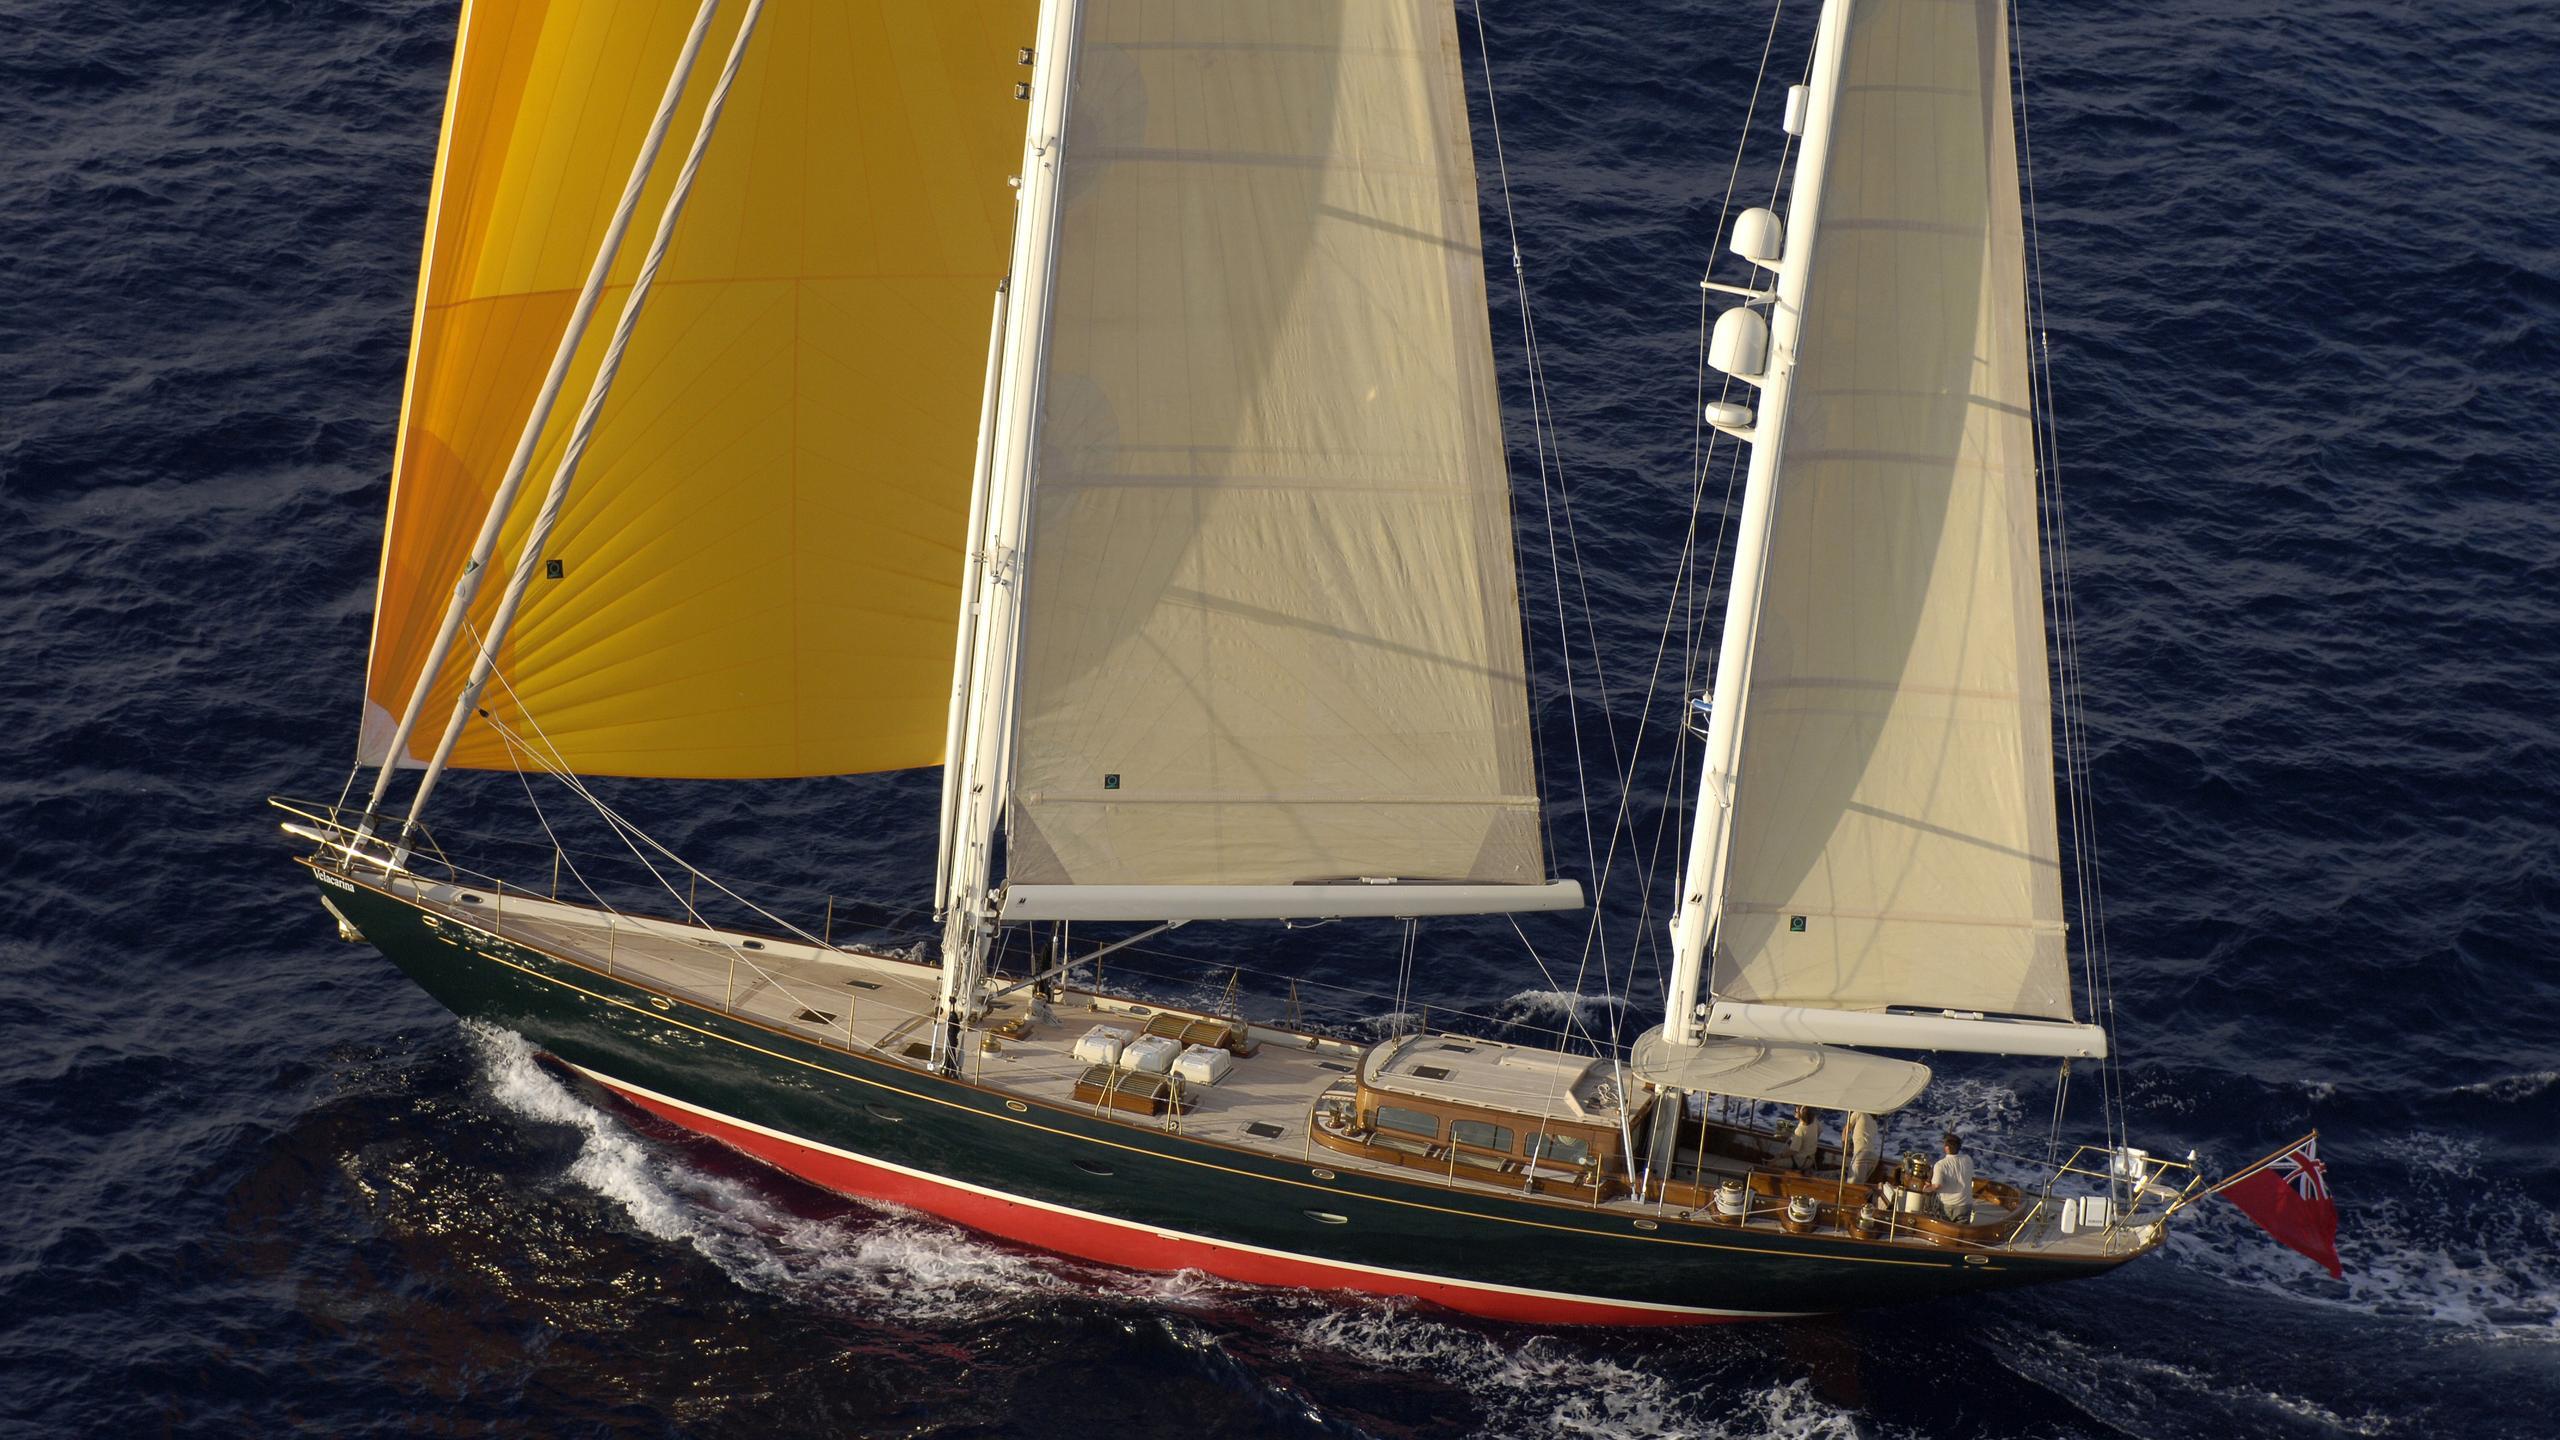 velacarina-yacht-for-sale-profile